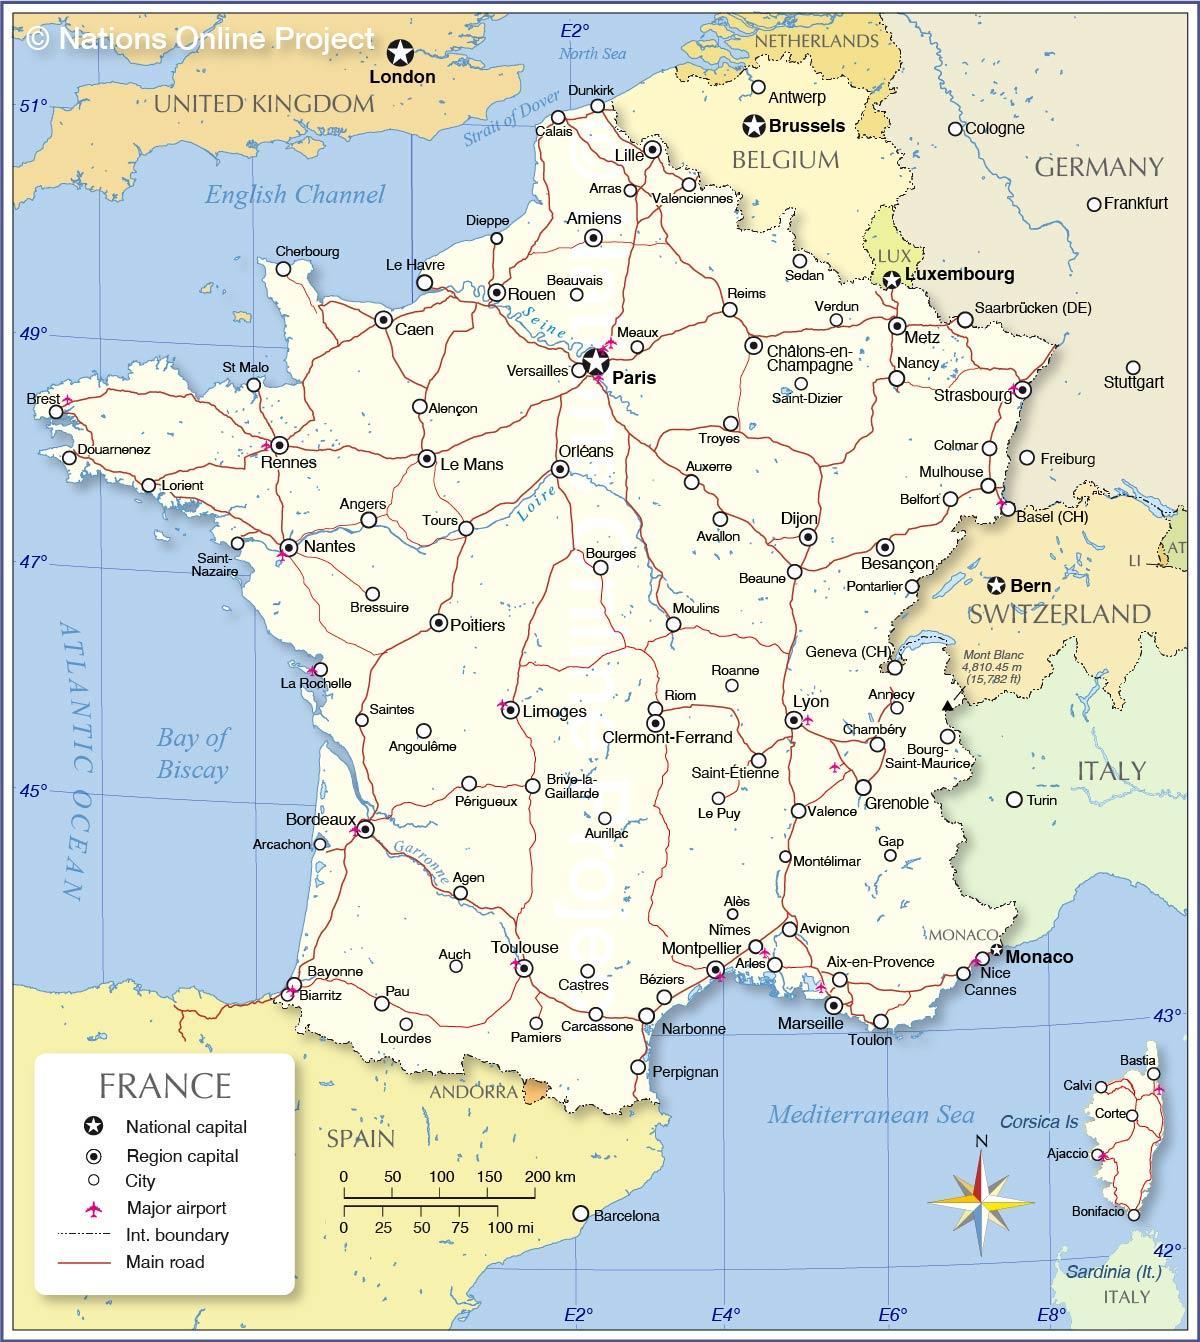 flygplatser i frankrike karta Internationella flygplatser i Frankrike karta   Frankrike  flygplatser i frankrike karta